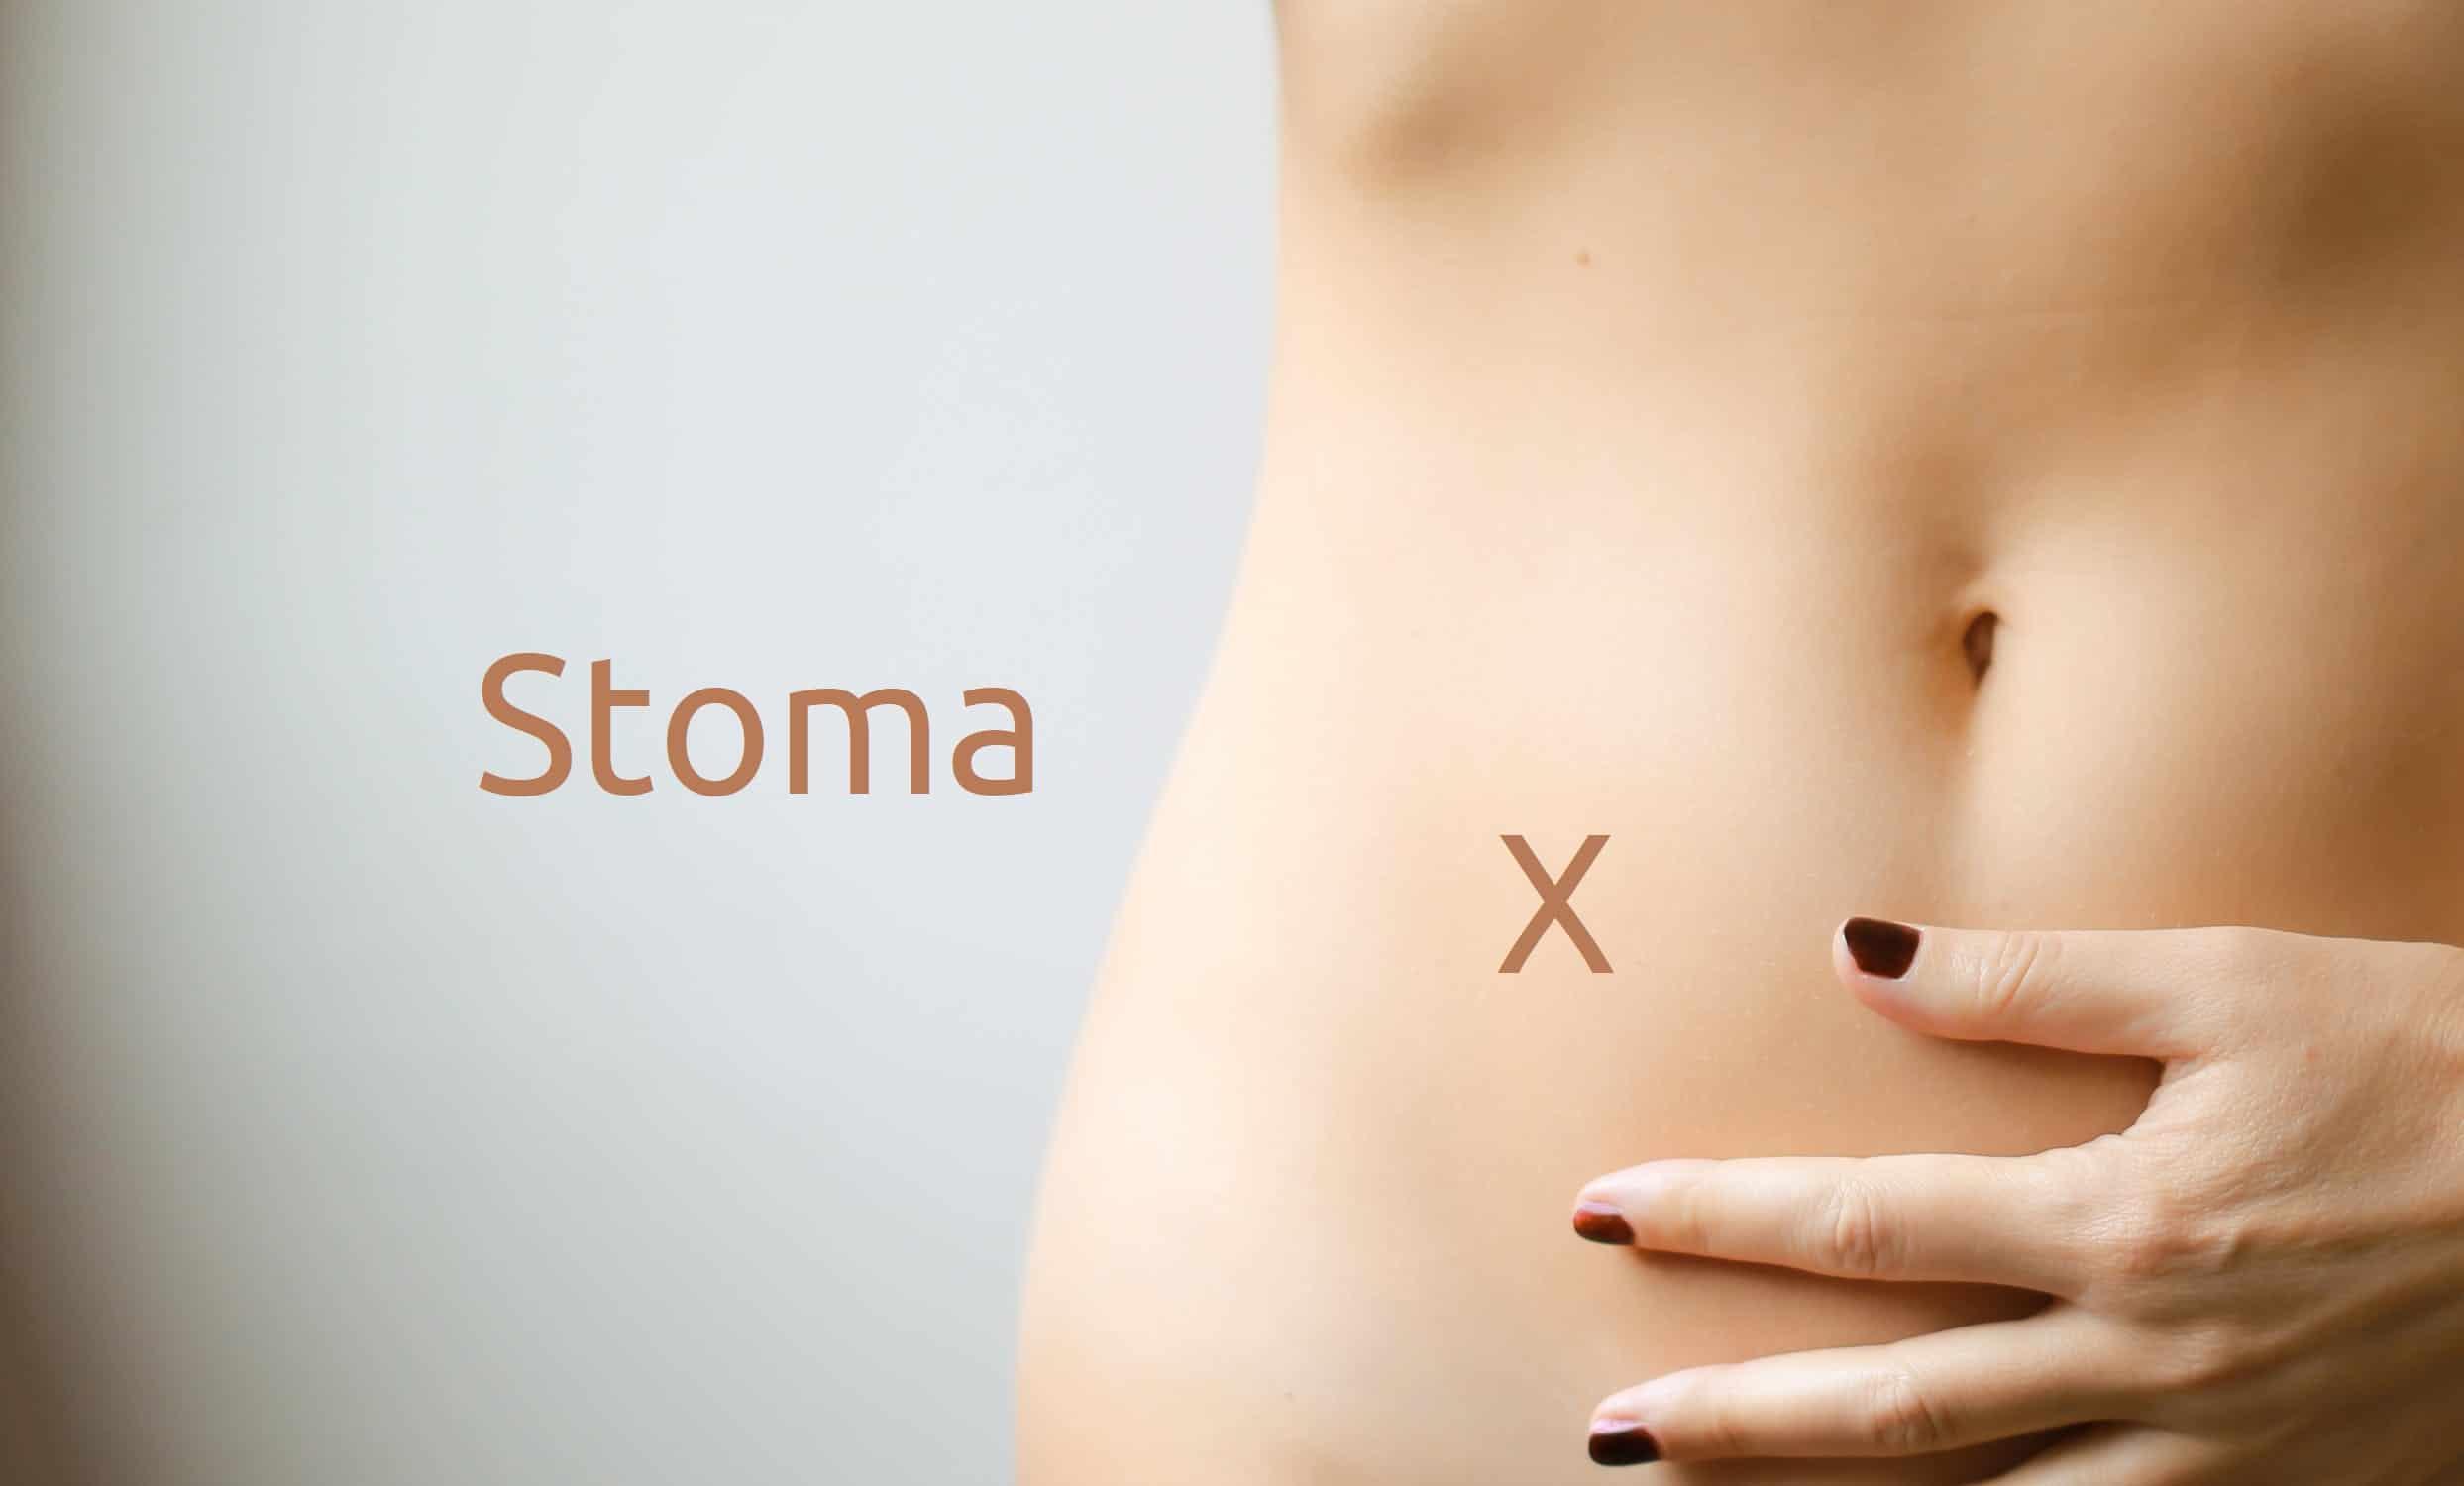 Was ist ein Stoma - Kolostomie oder Ileostomie